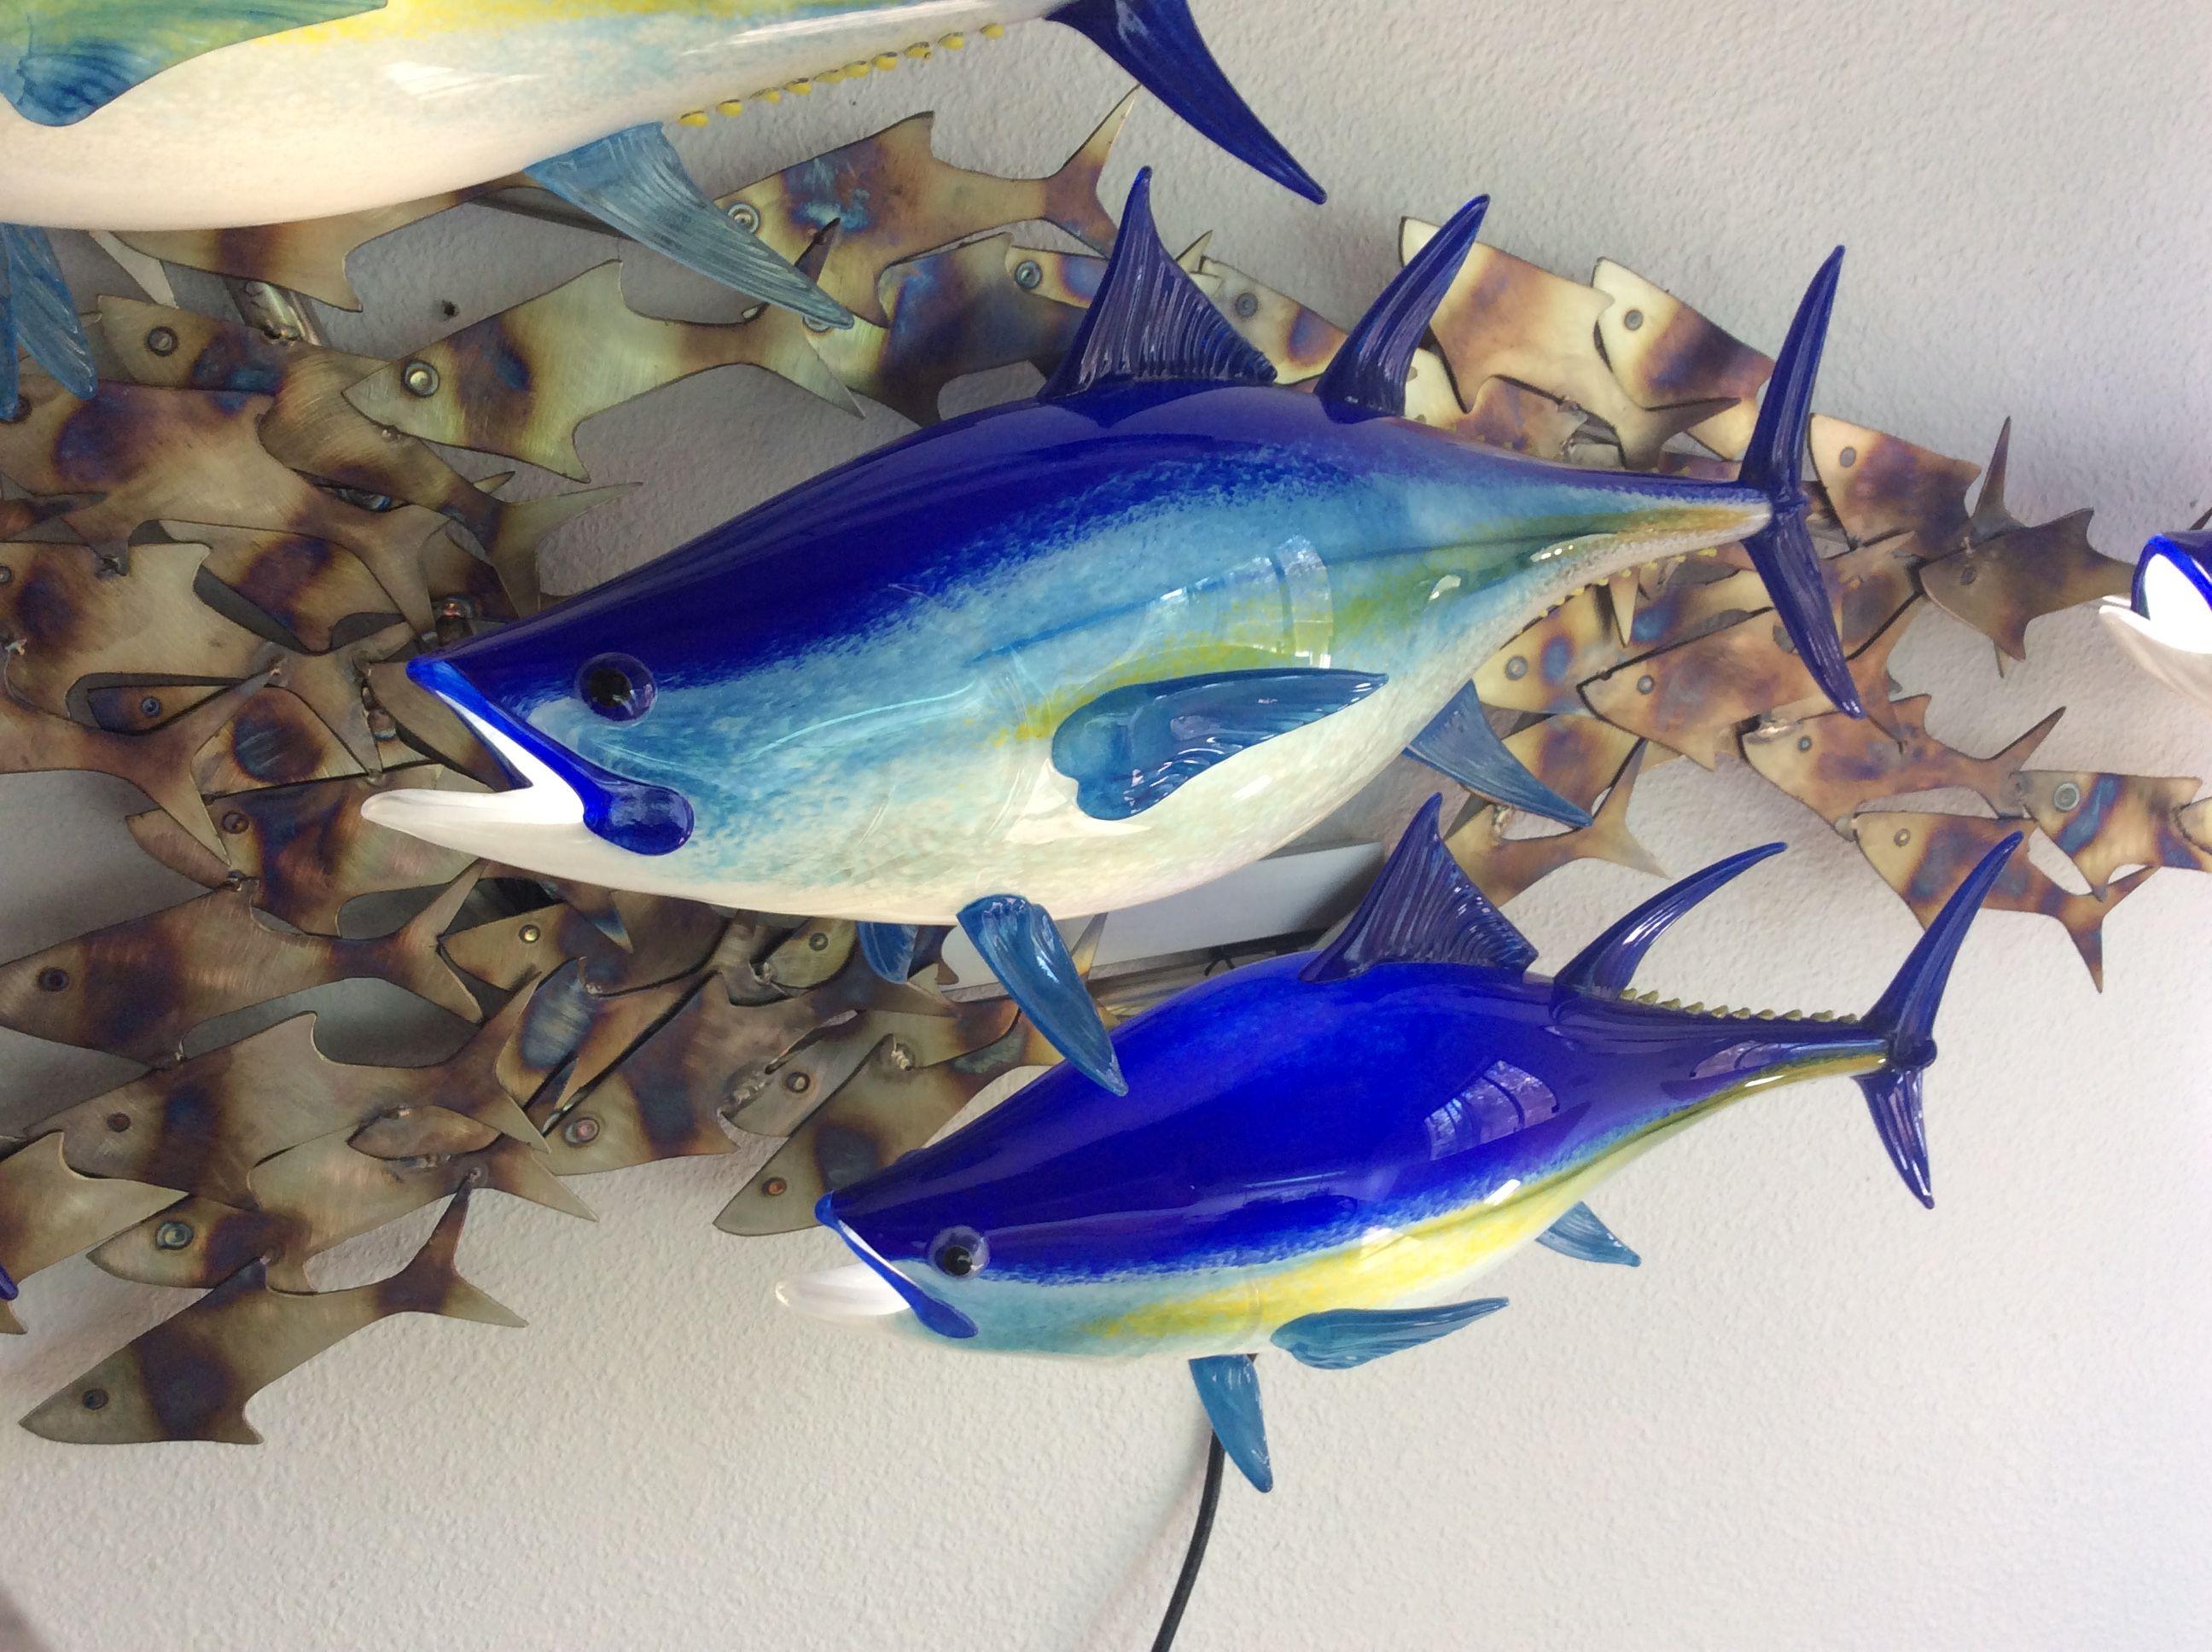 Bluefin Tuna closeup wall-mount by Michael Hopko #stunning #hopkoartglass #hopko #wallmounts #interiordesign #homedecor